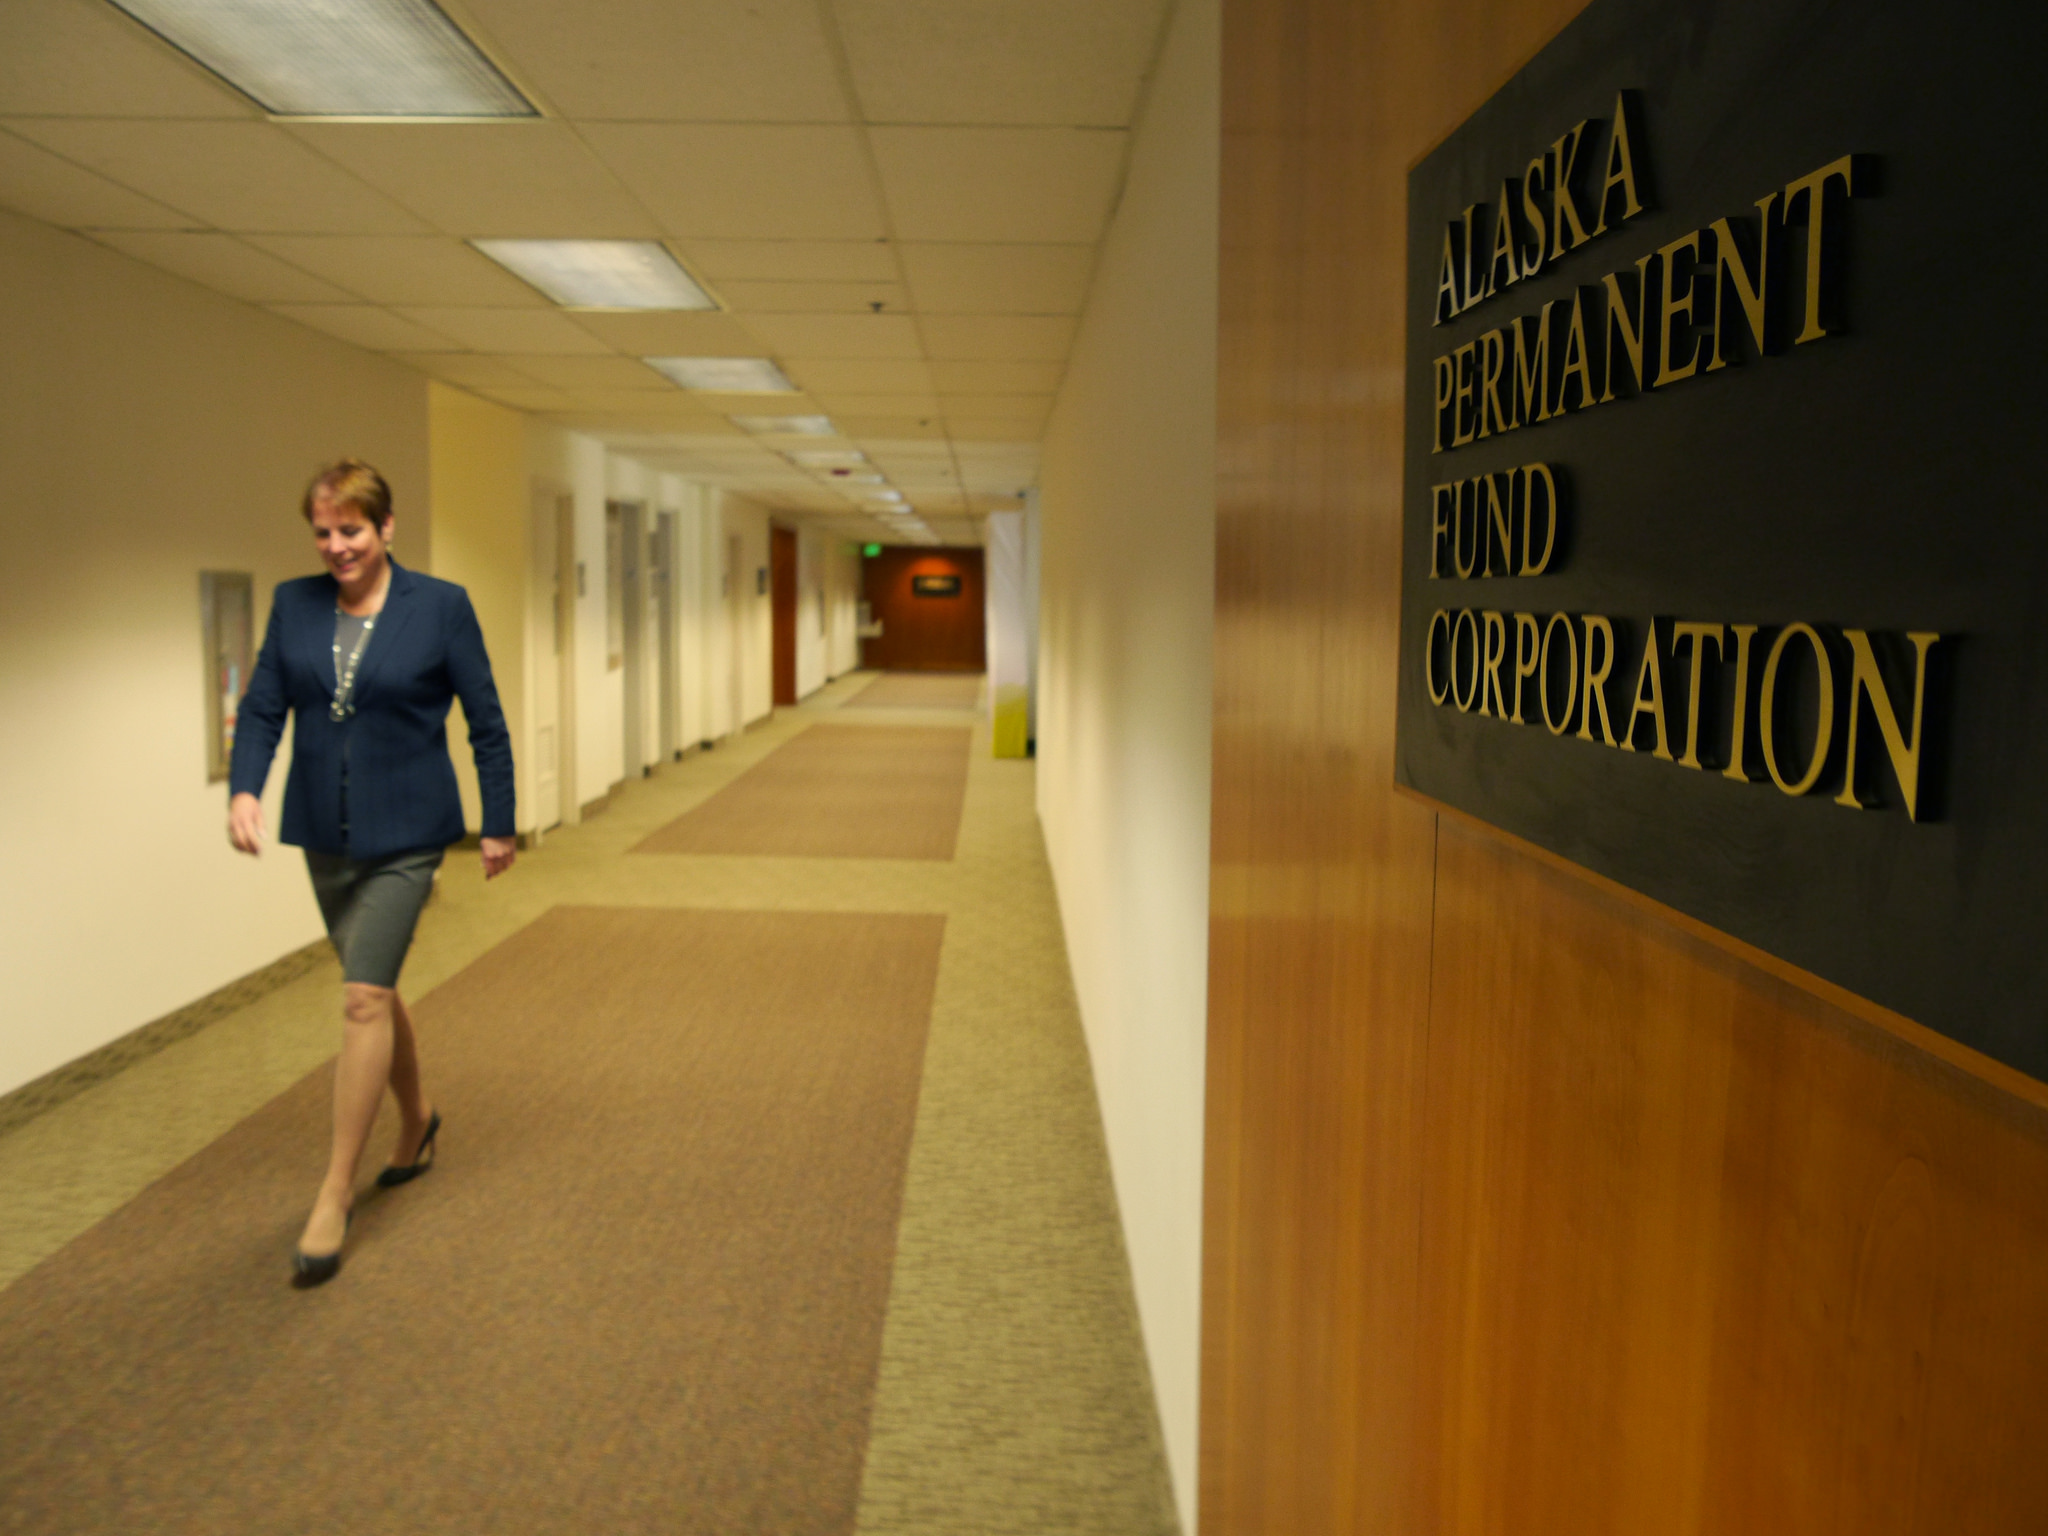 Inside the Alaska Permanent Fund Corp.